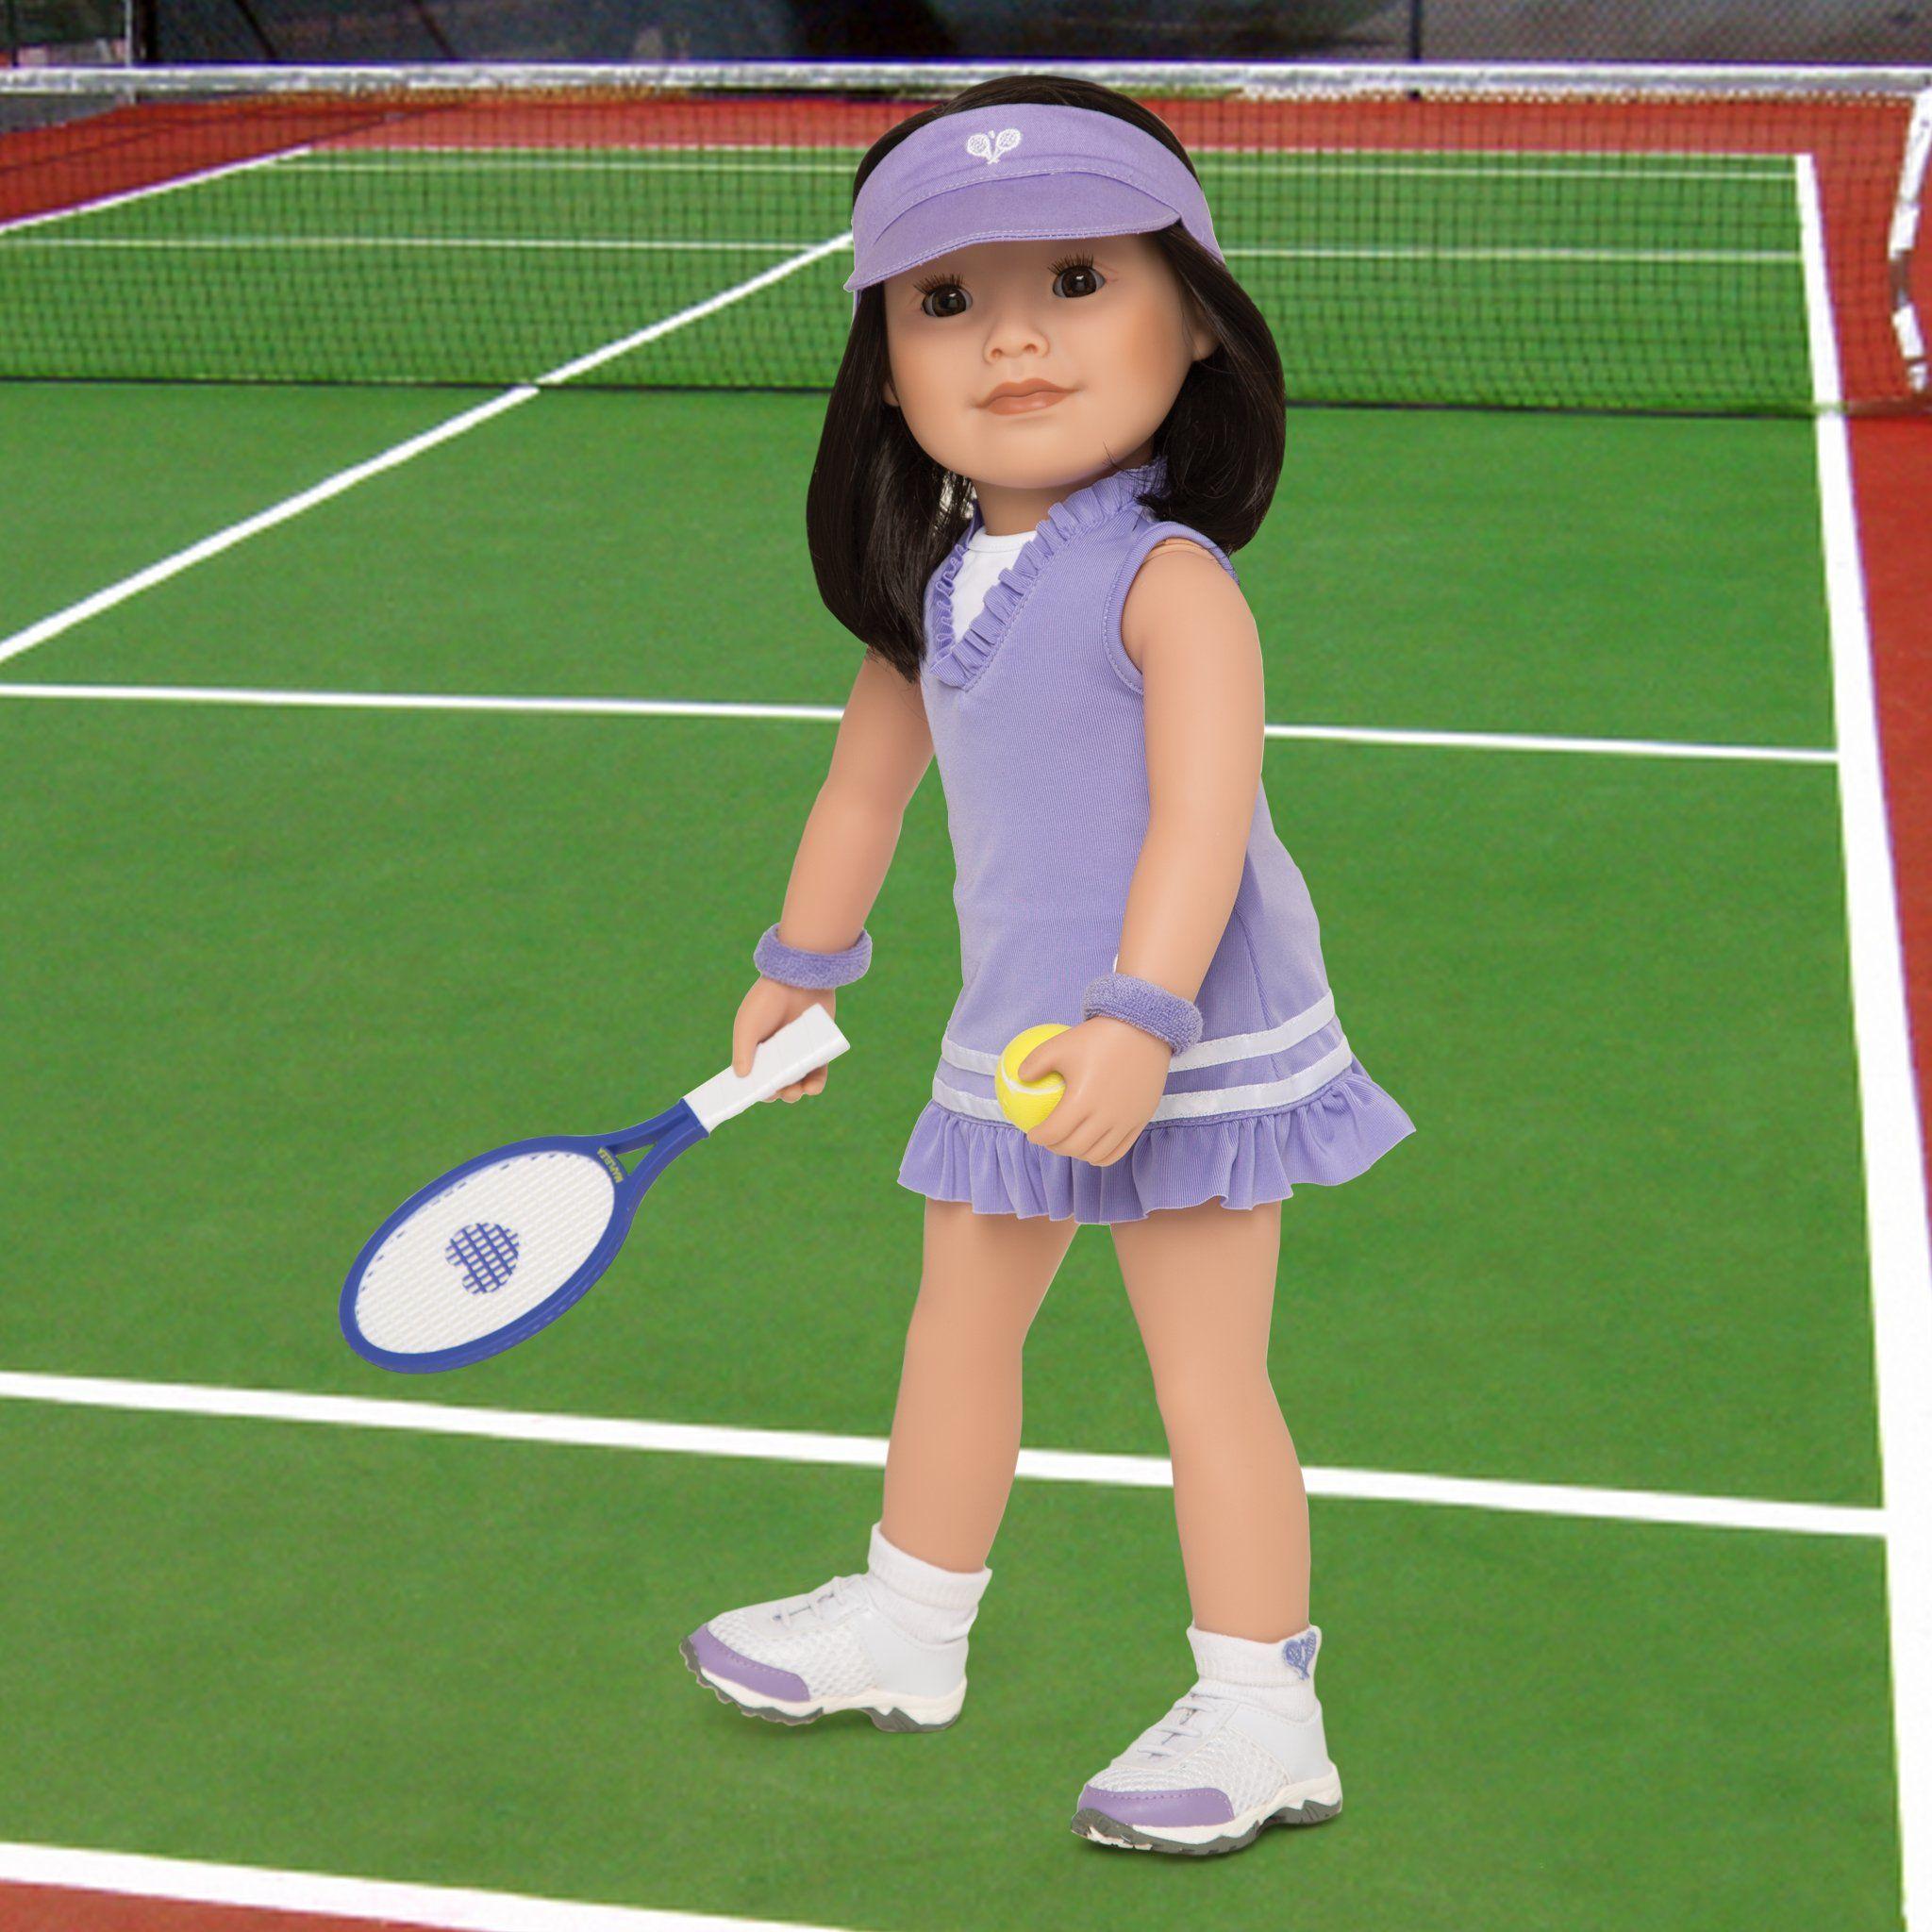 ad3cd0b68f2b2 18 inch doll wearing tennis dress, visor, socks, undies, tennis ...